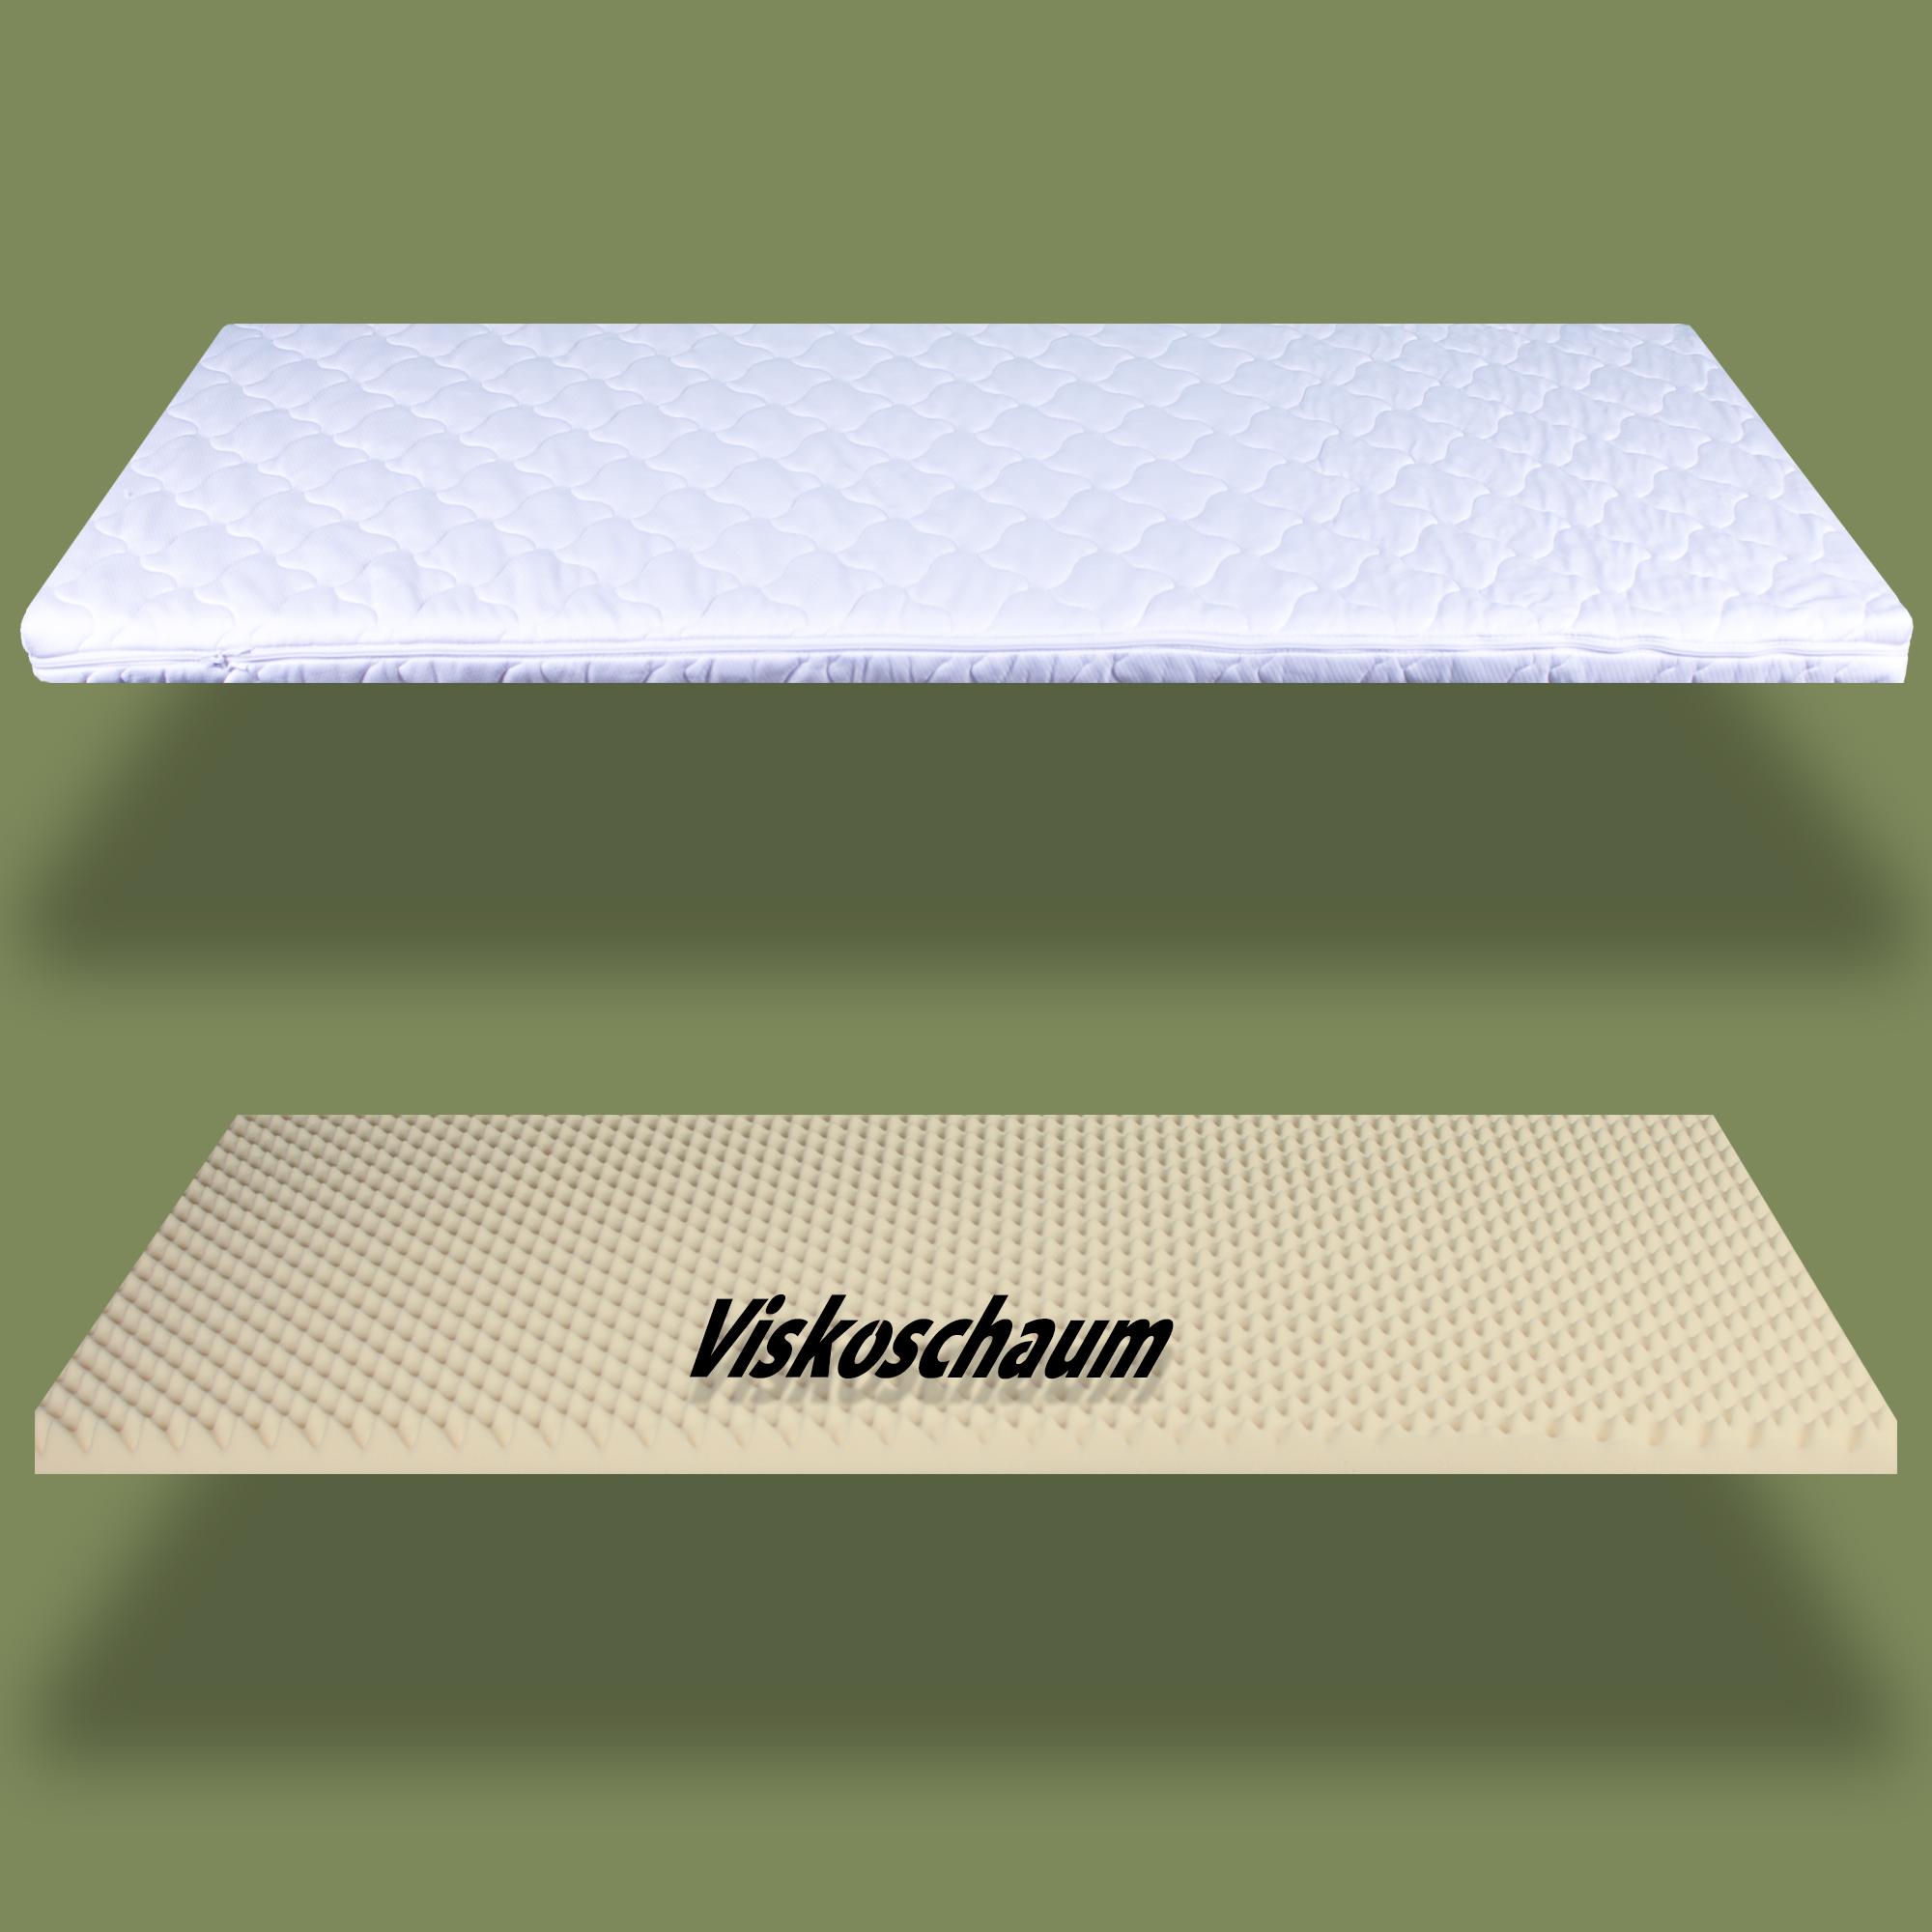 topper bezug 140x200 finest alan x schwarz matratze und topper with topper bezug 140x200 best. Black Bedroom Furniture Sets. Home Design Ideas